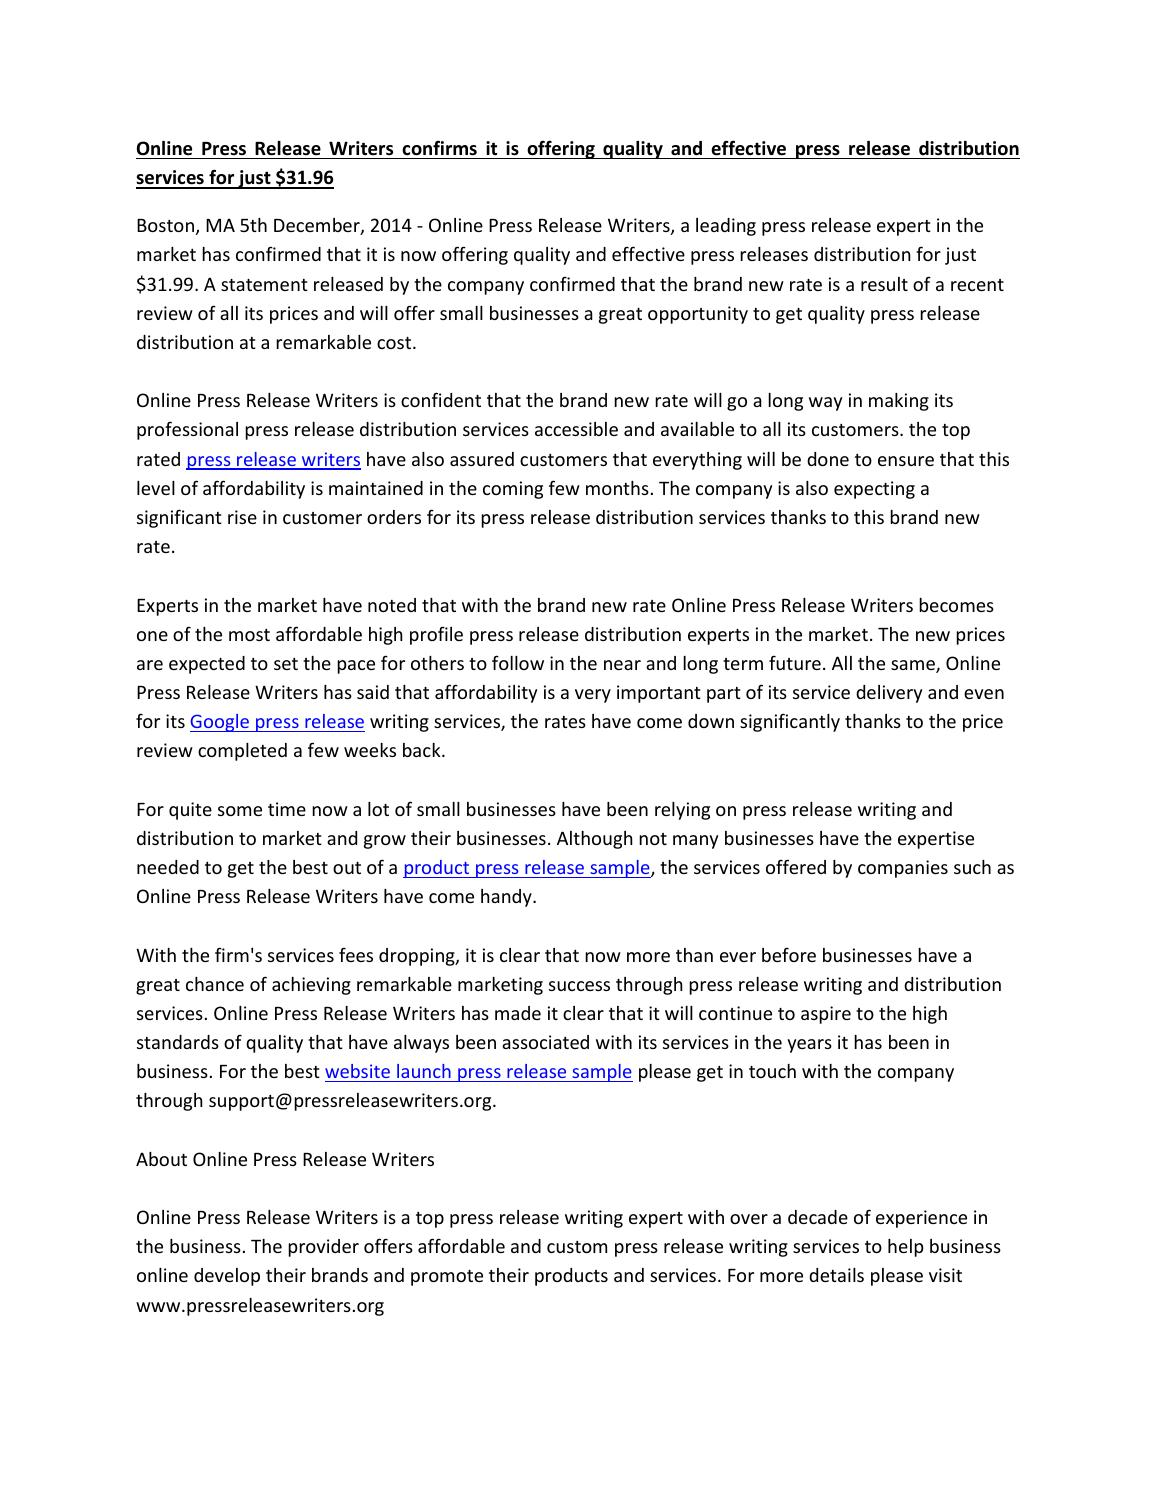 sample event press release